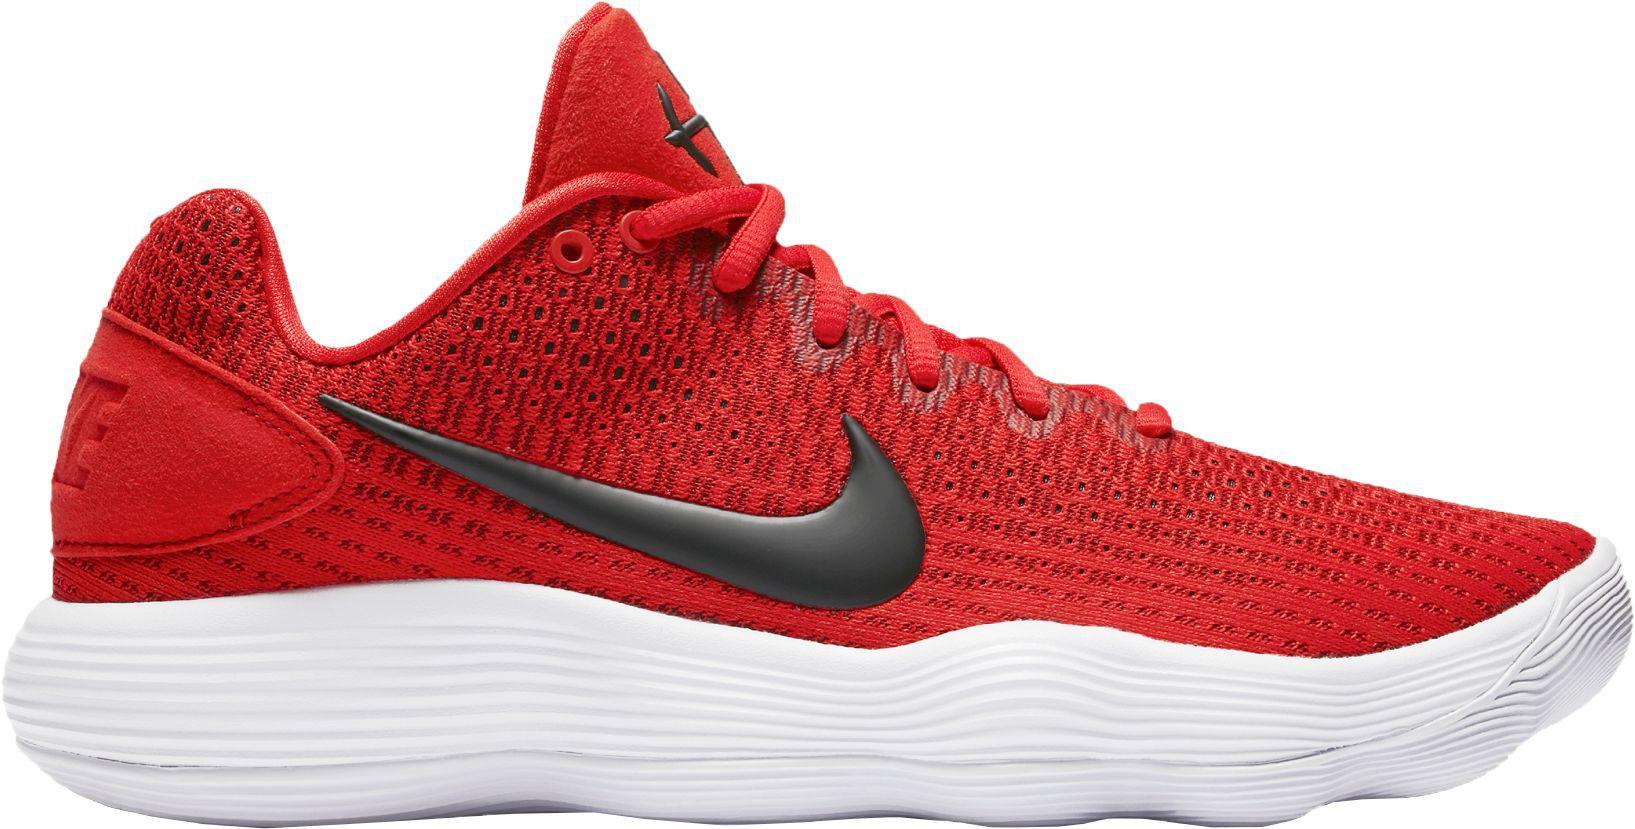 59c6956807d Nike - Multicolor React Hyperdunk 2017 Low Basketball Shoes for Men - Lyst